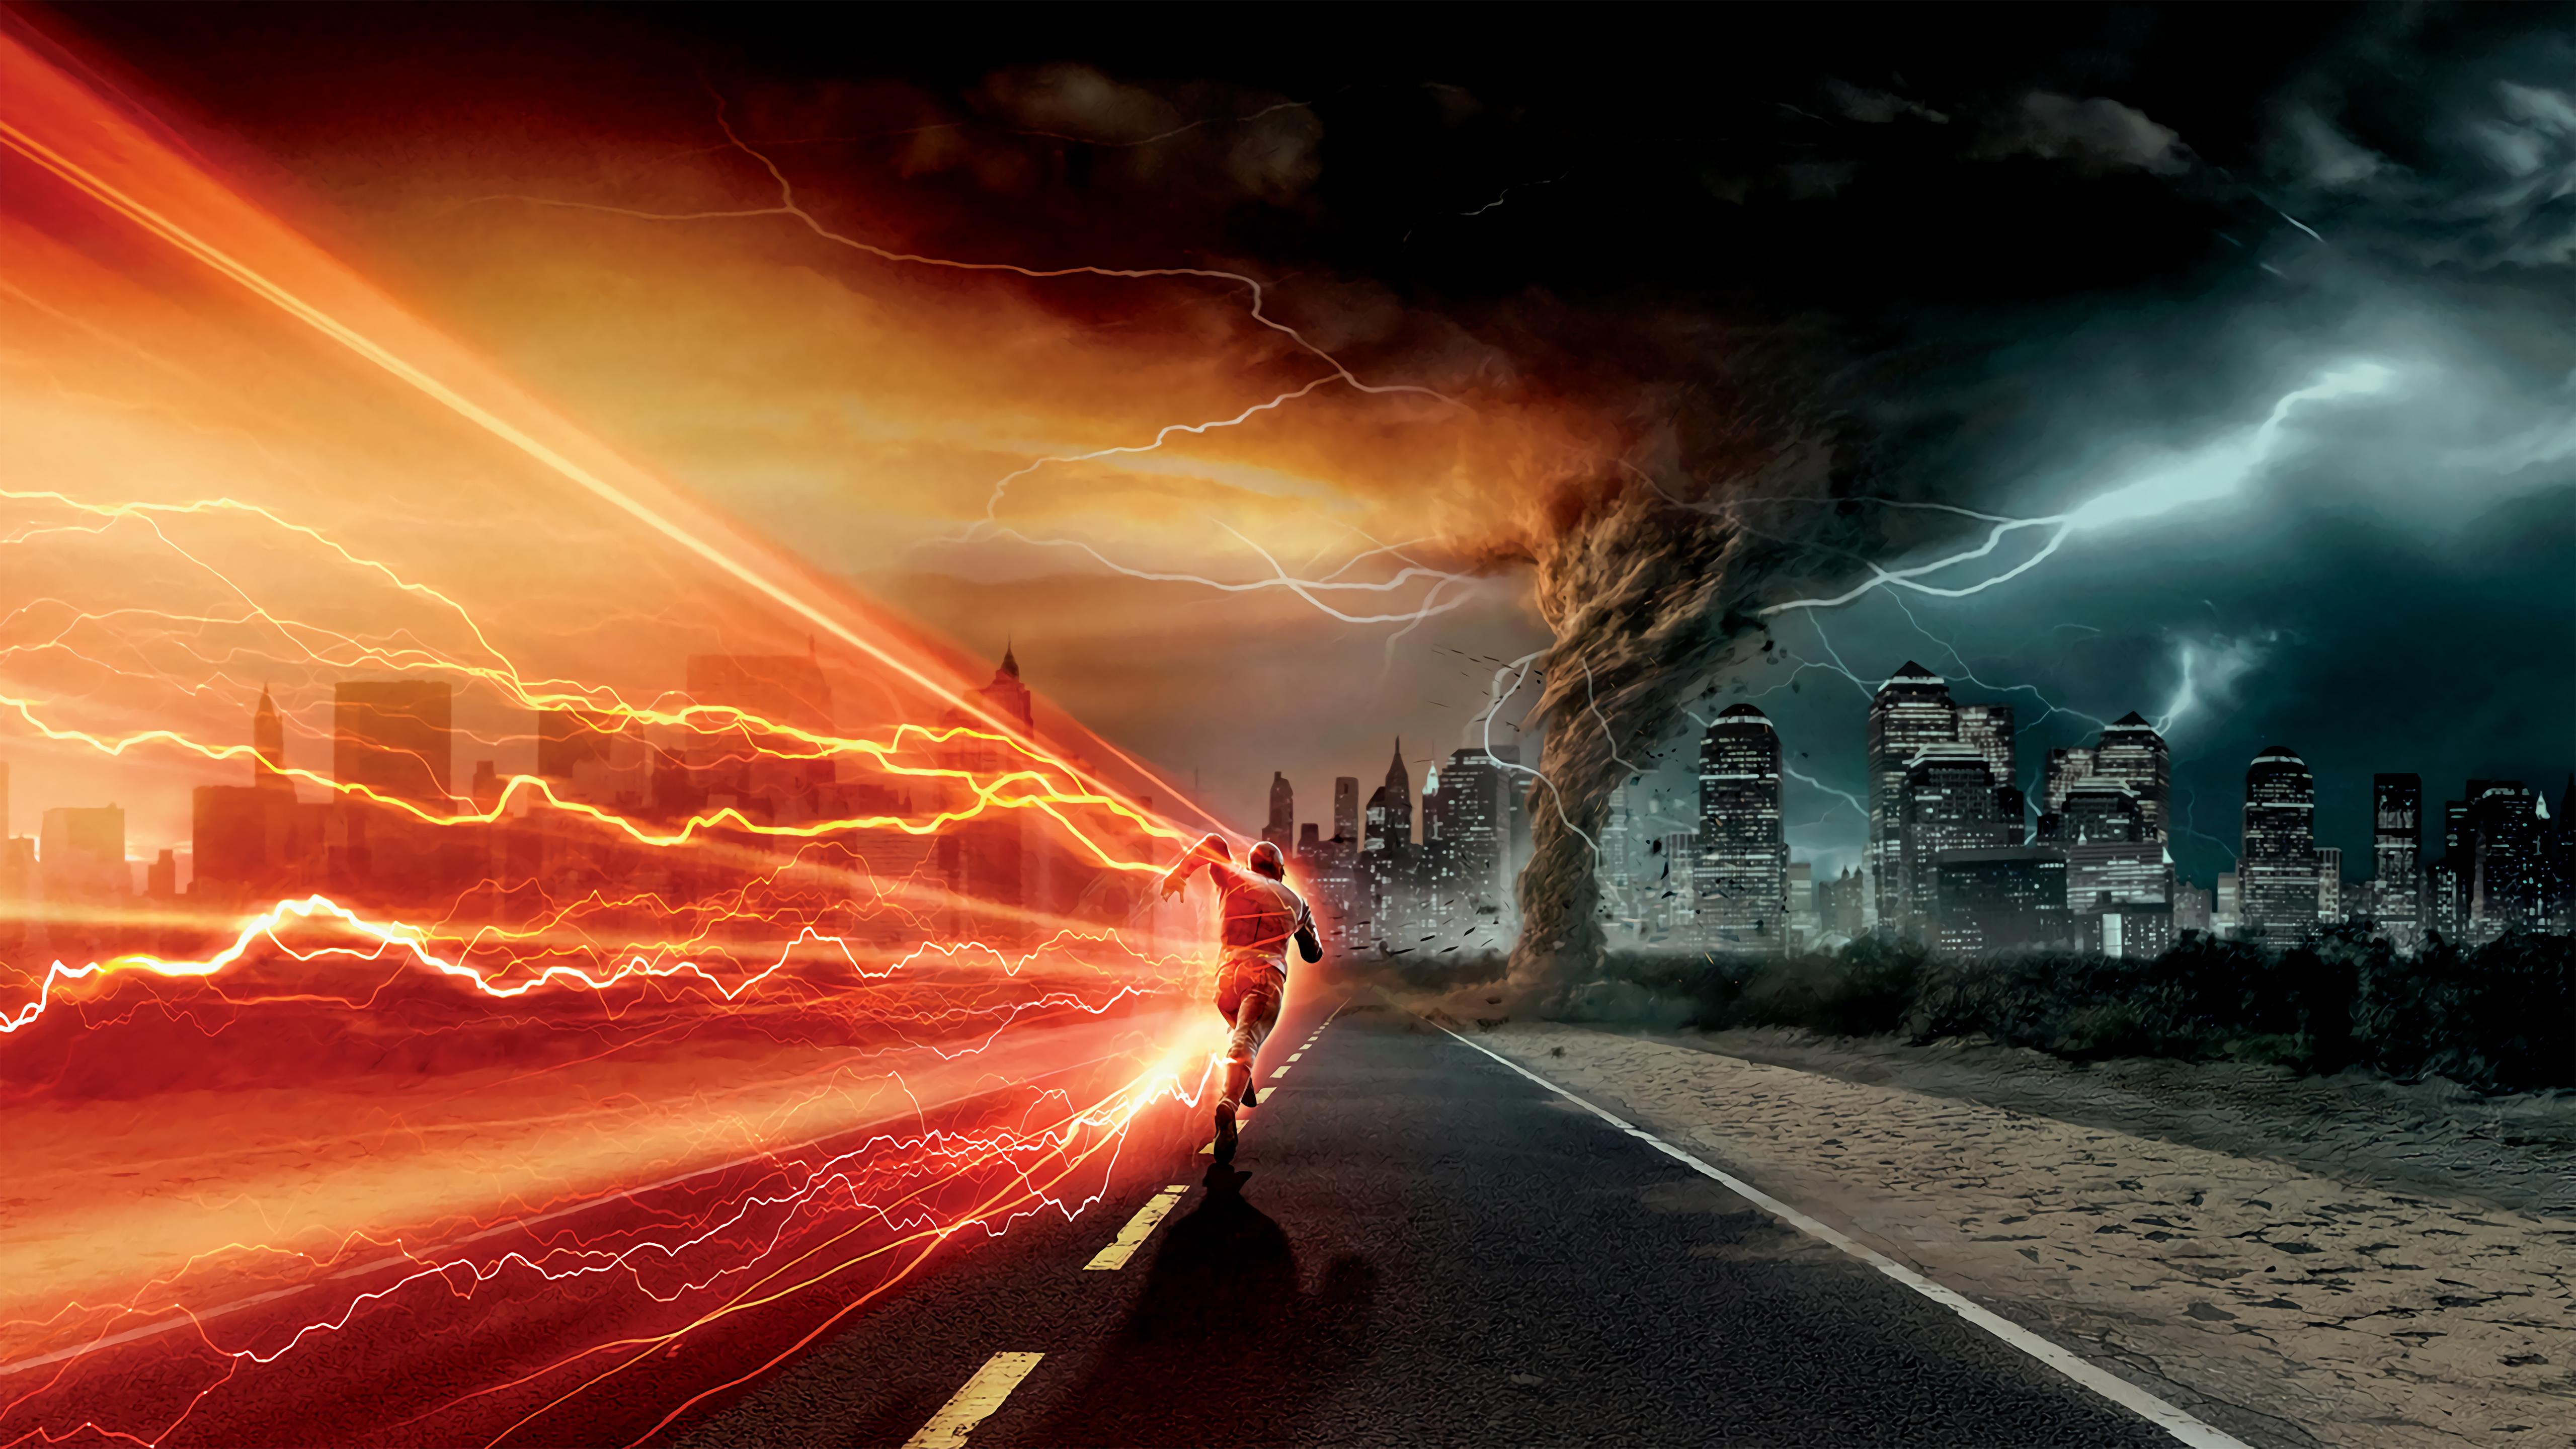 the flash run 4k 1627769779 - The Flash Run 4k - The Flash Run 4k wallpapers